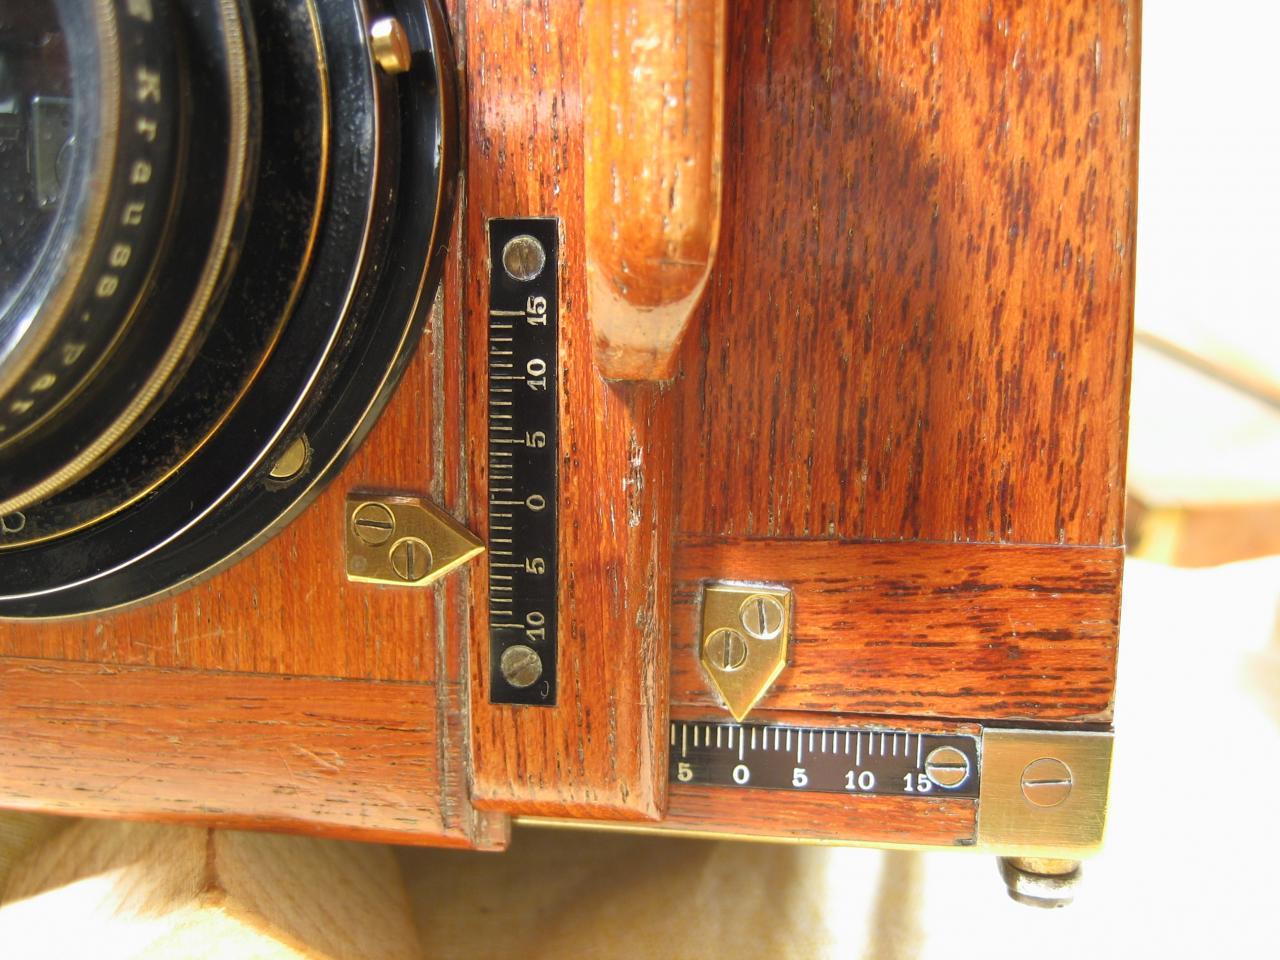 Wallpaper Appareils photos 1118-5 GAUMONT  Leon, Reporter tropical, collection AMI